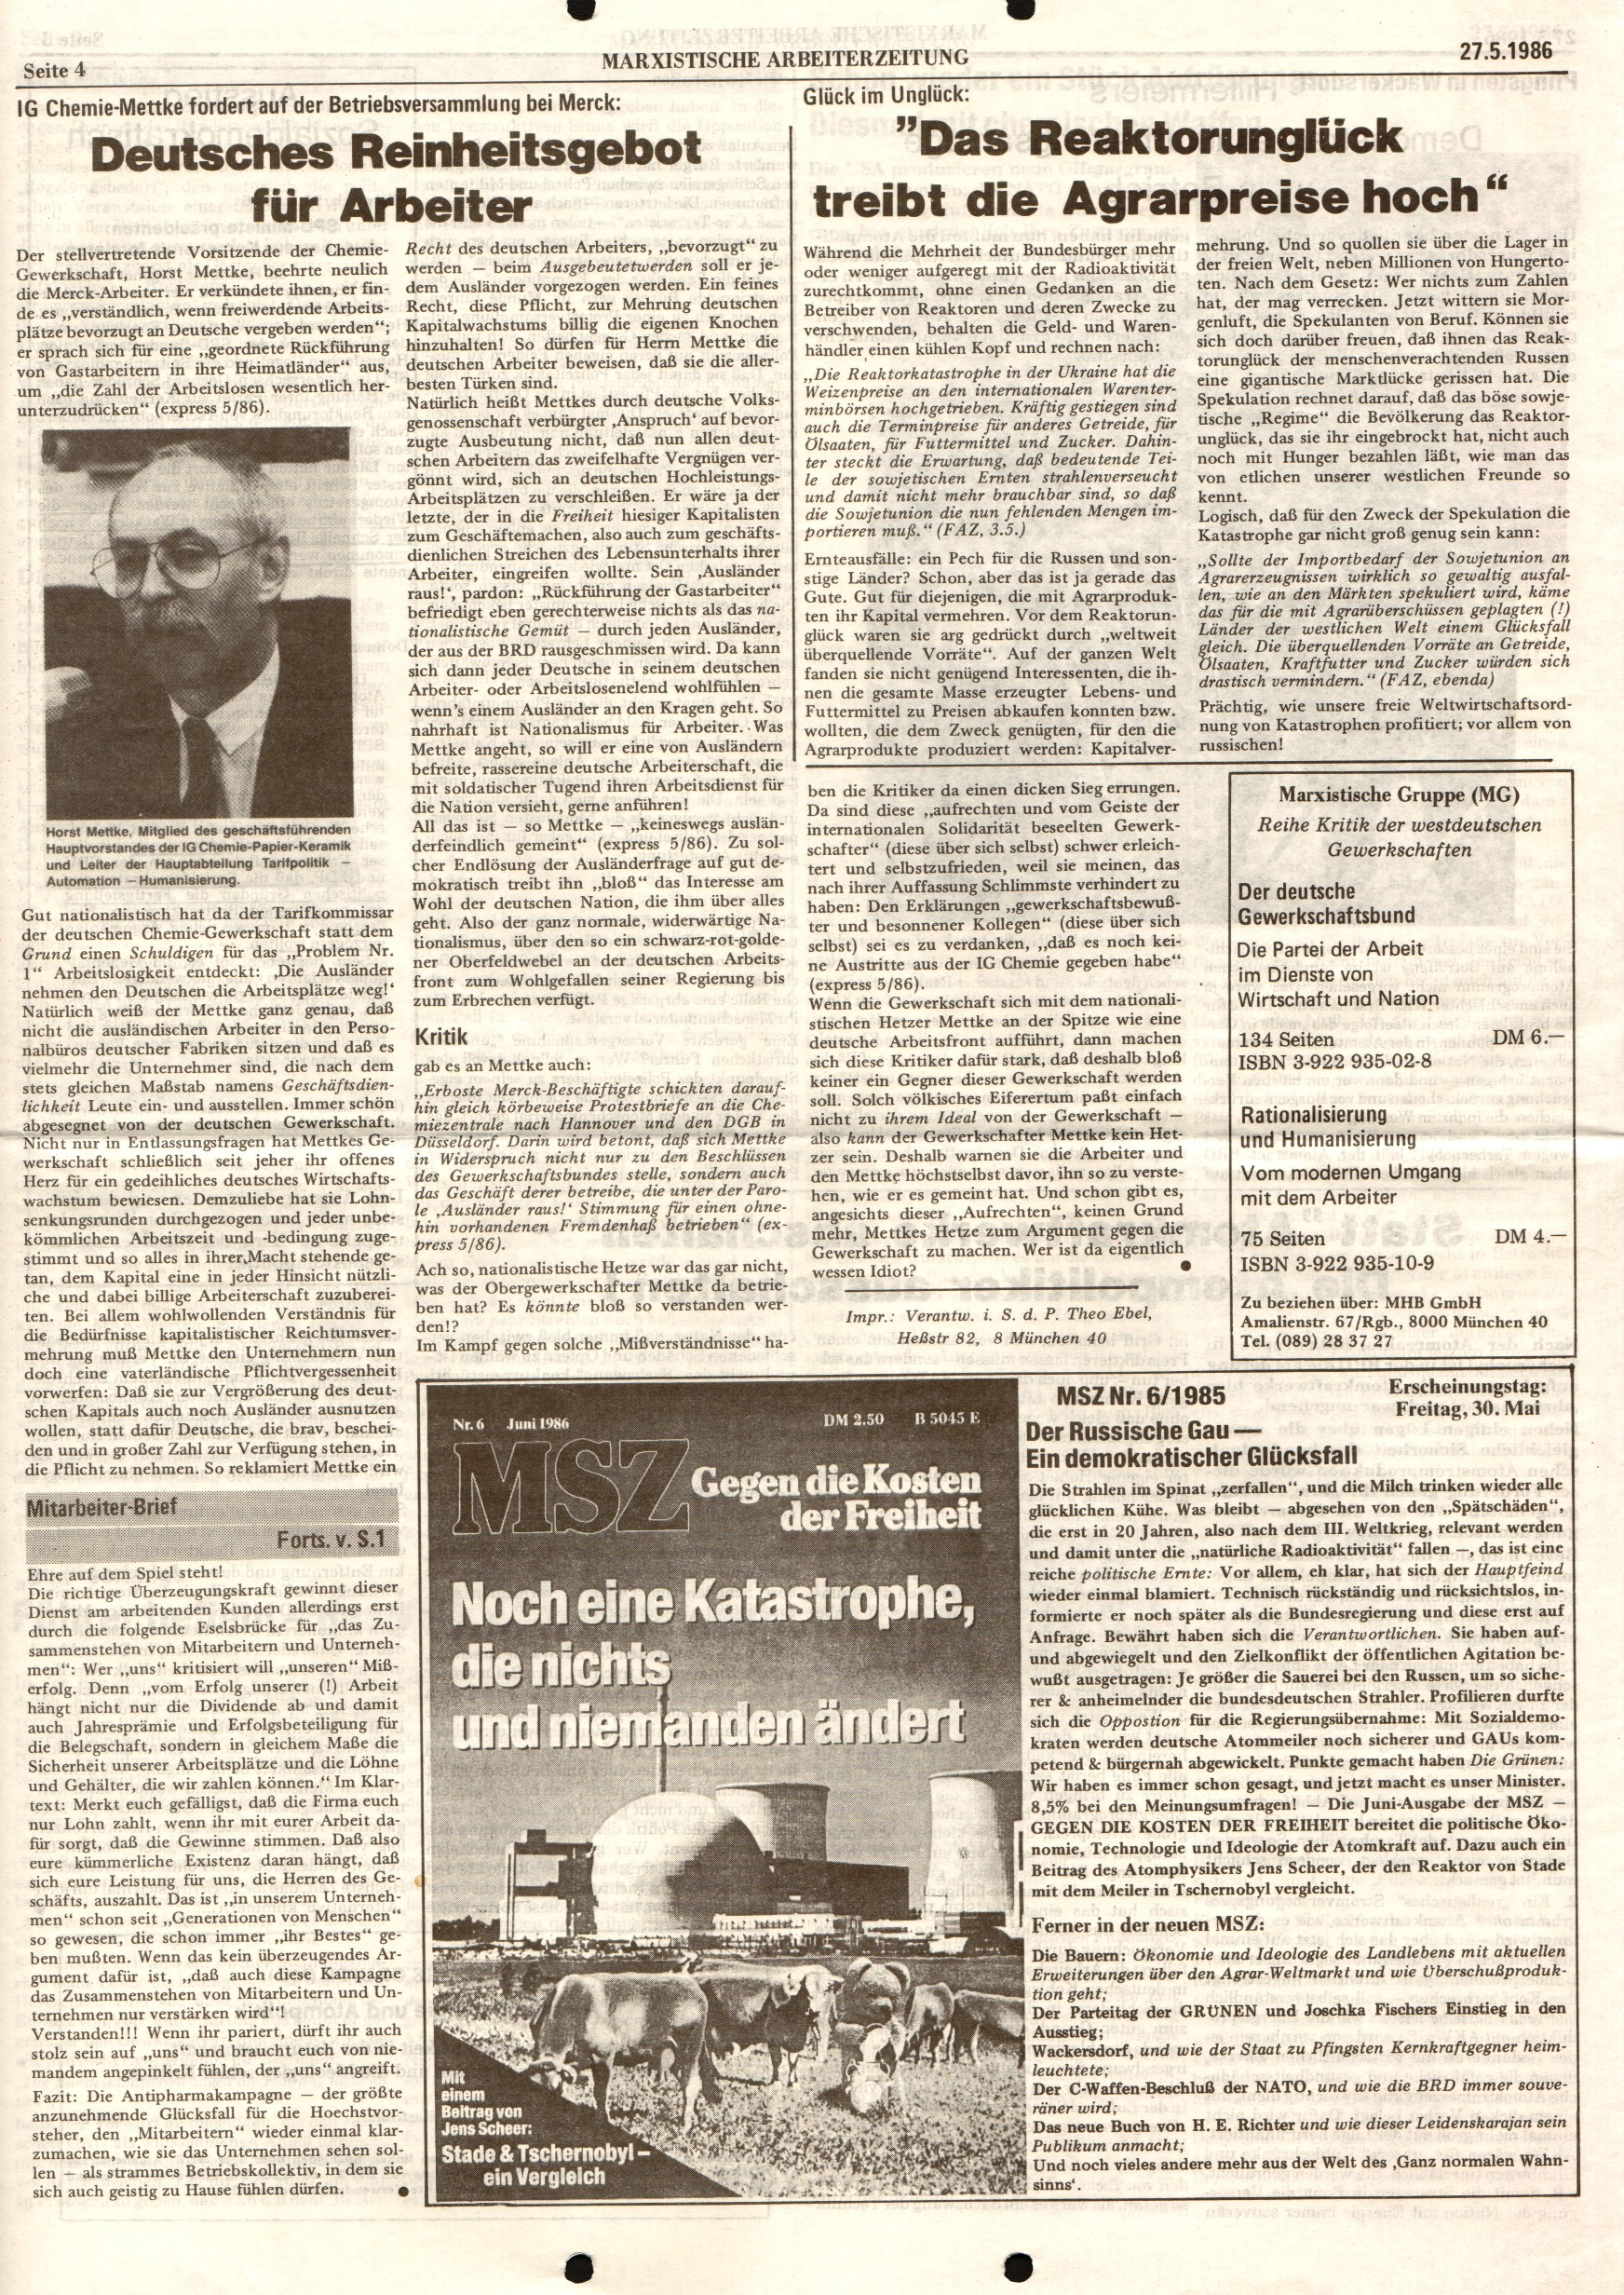 Frankfurt_CPK_Hoechst_MAZ380